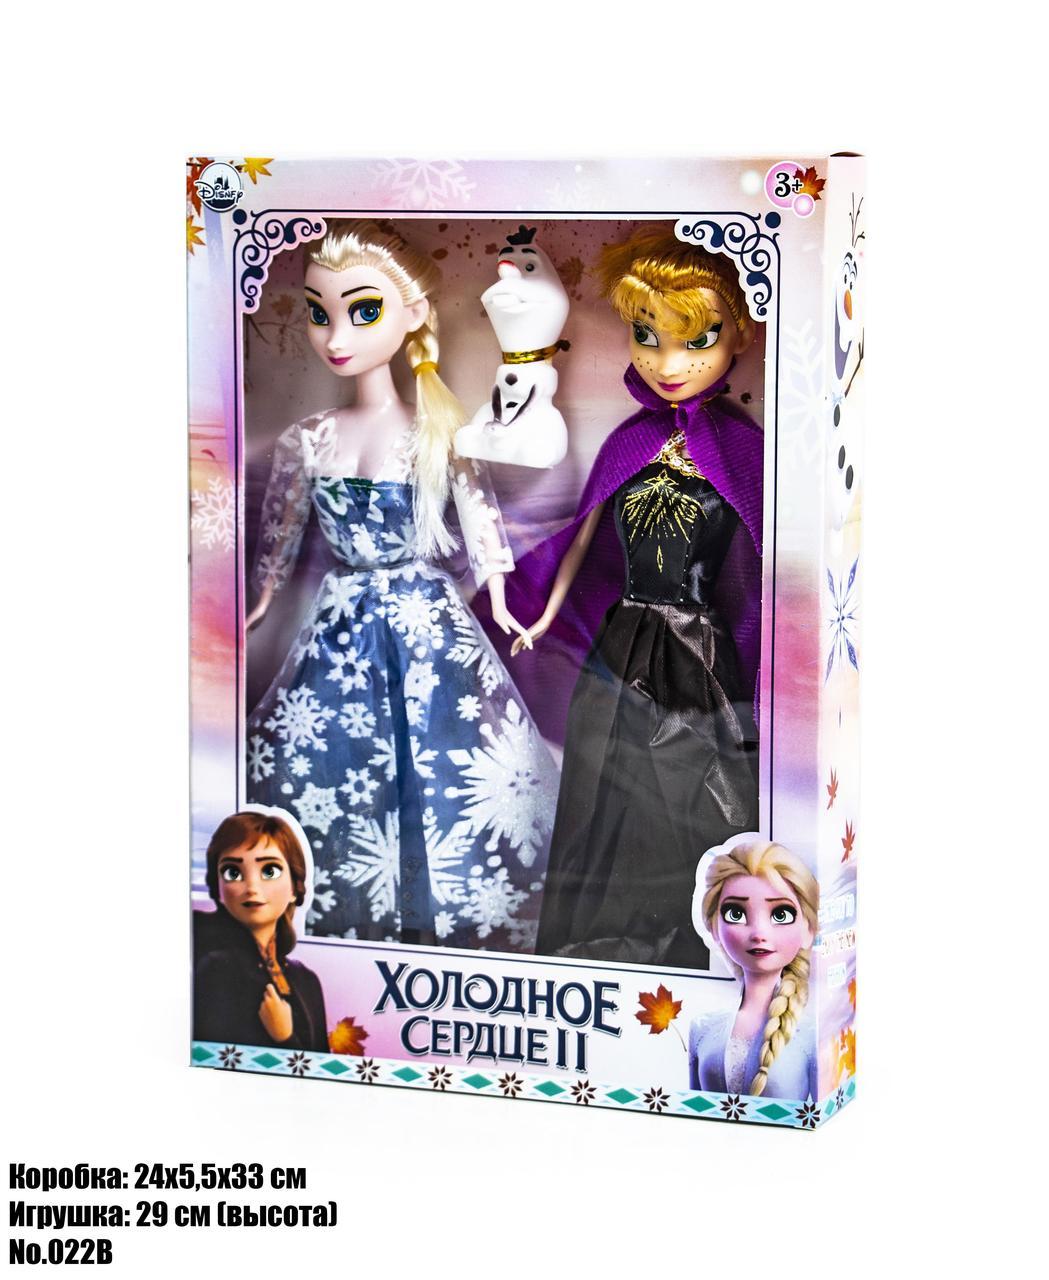 "Набор кукол ""Холодное сердце"" - Эльза и Анна, код 022B"